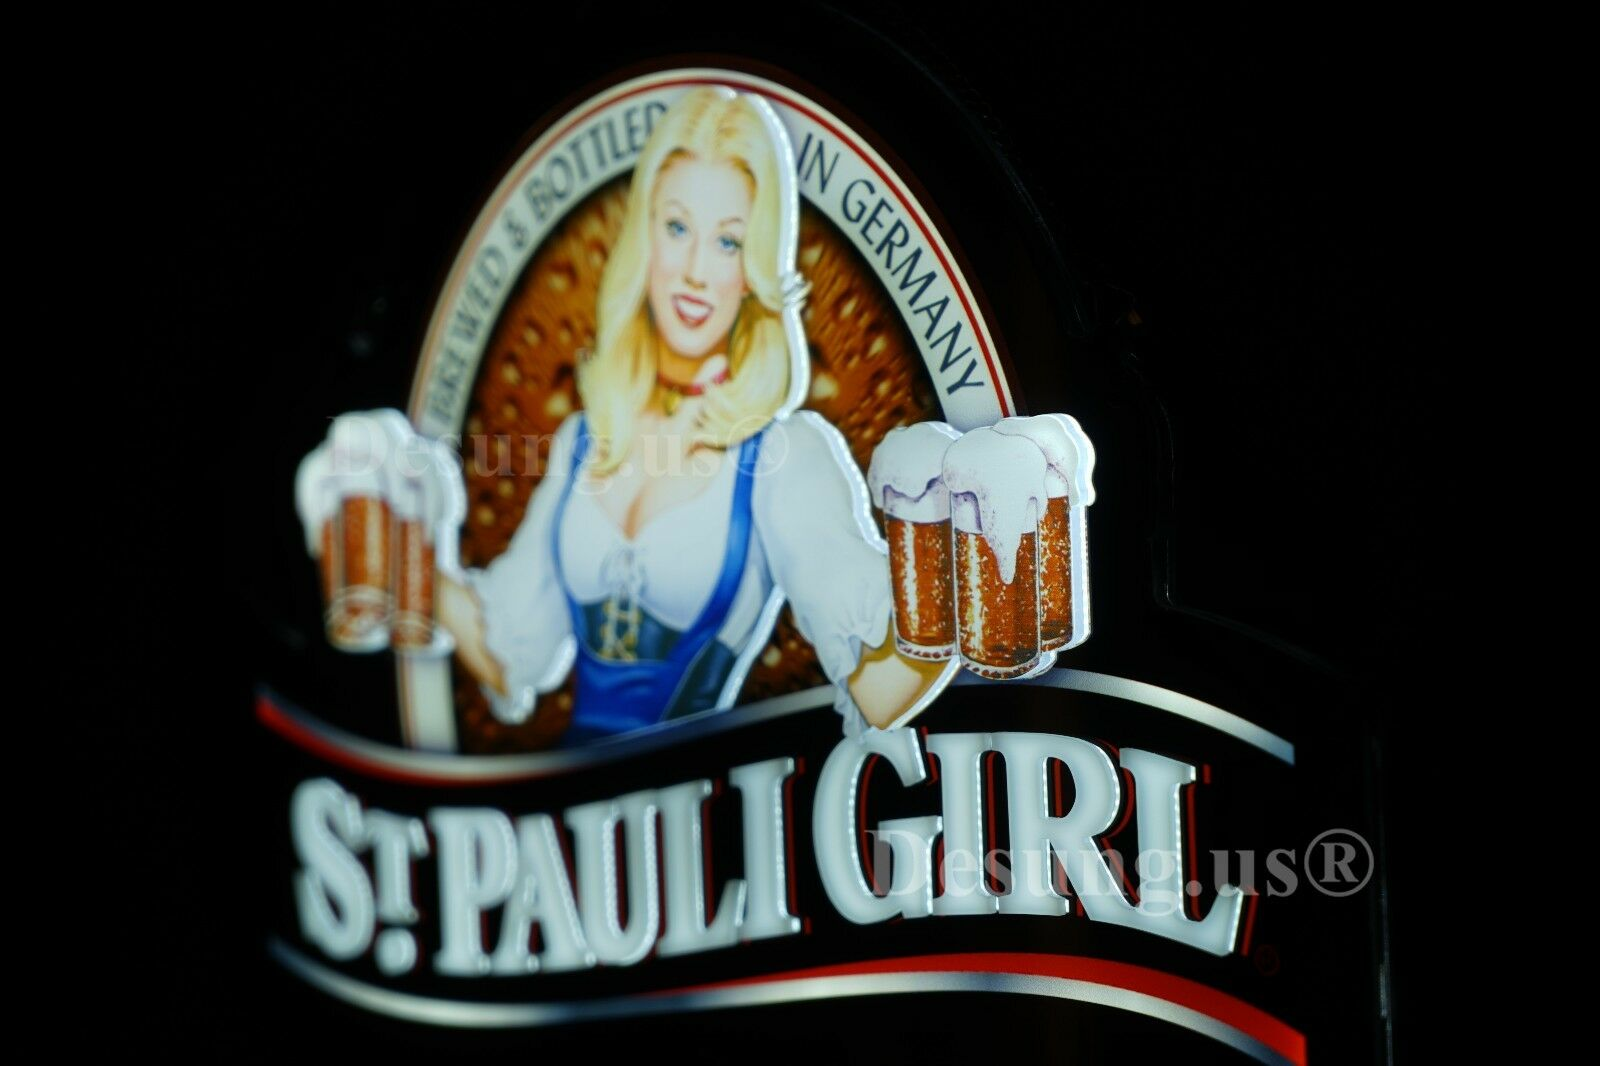 st-pauli-girl-picture